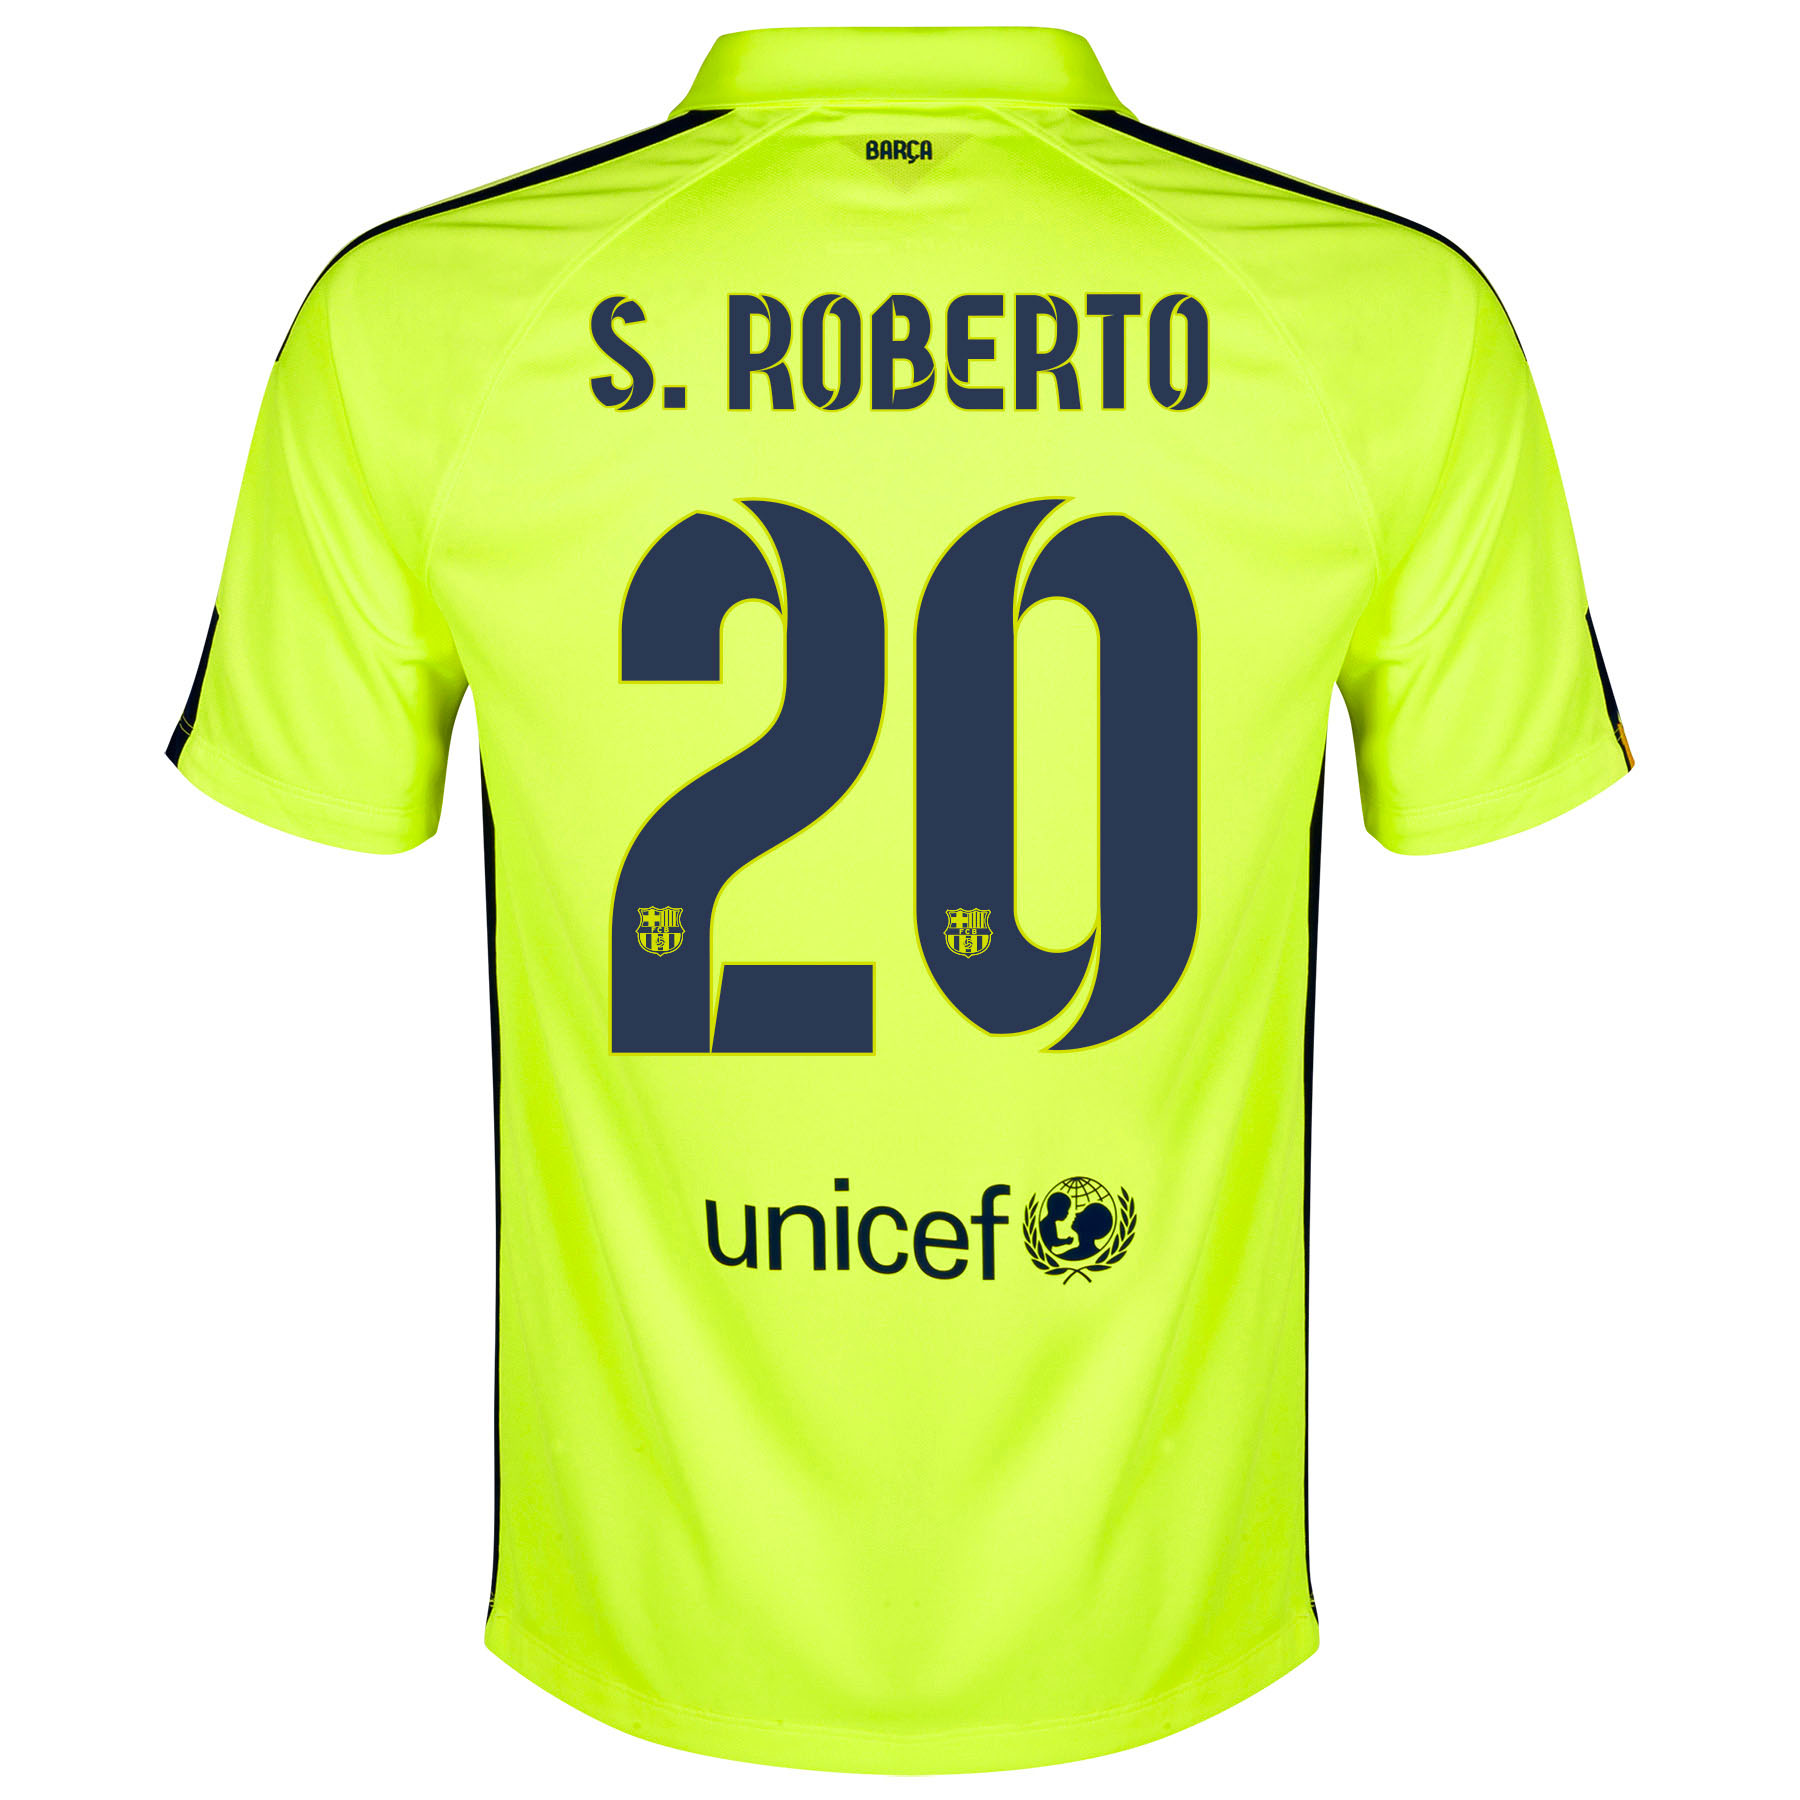 Barcelona Third Shirt 2014/15 Yellow with S.Roberto 20 printing